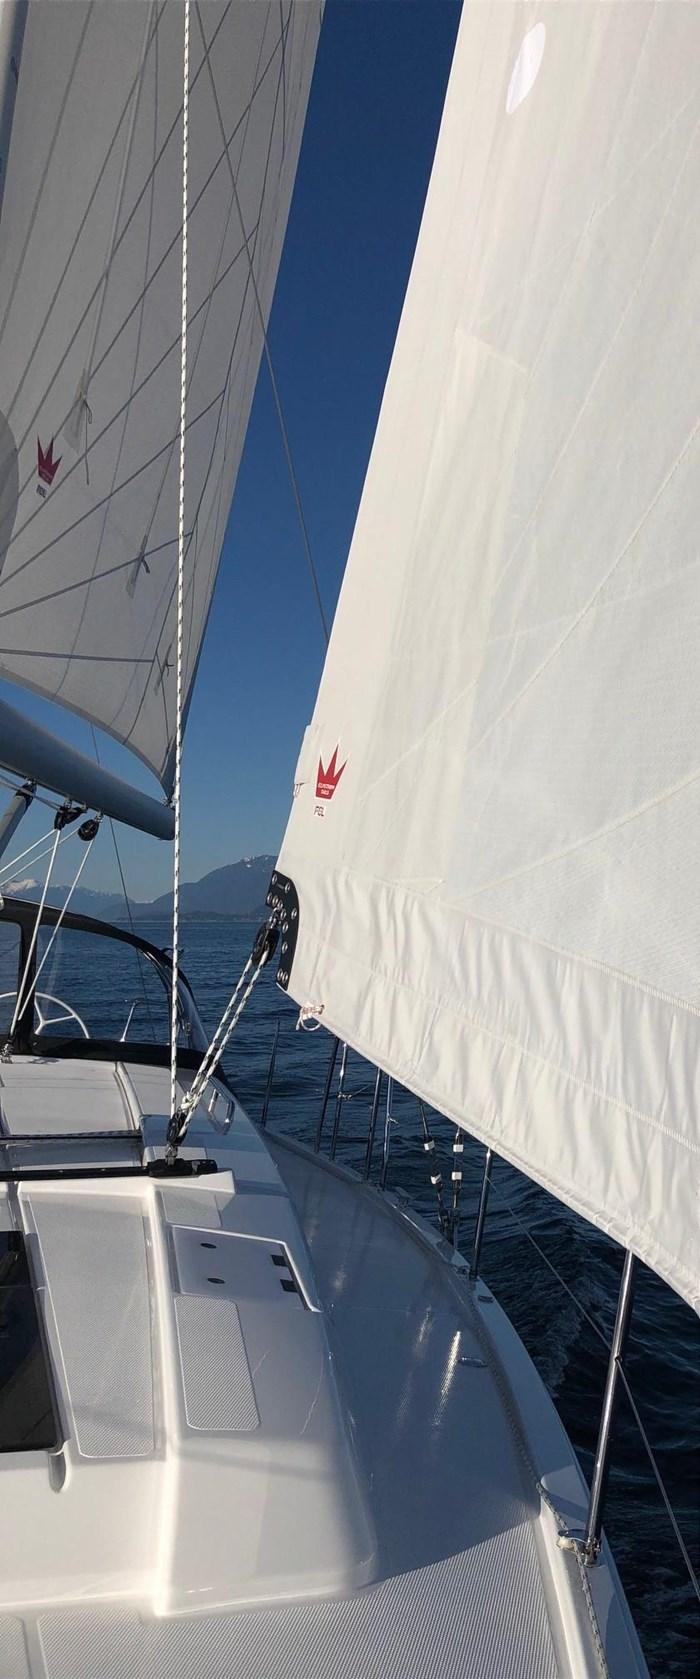 2020 Hanse Yachts 418 Photo 29 sur 46